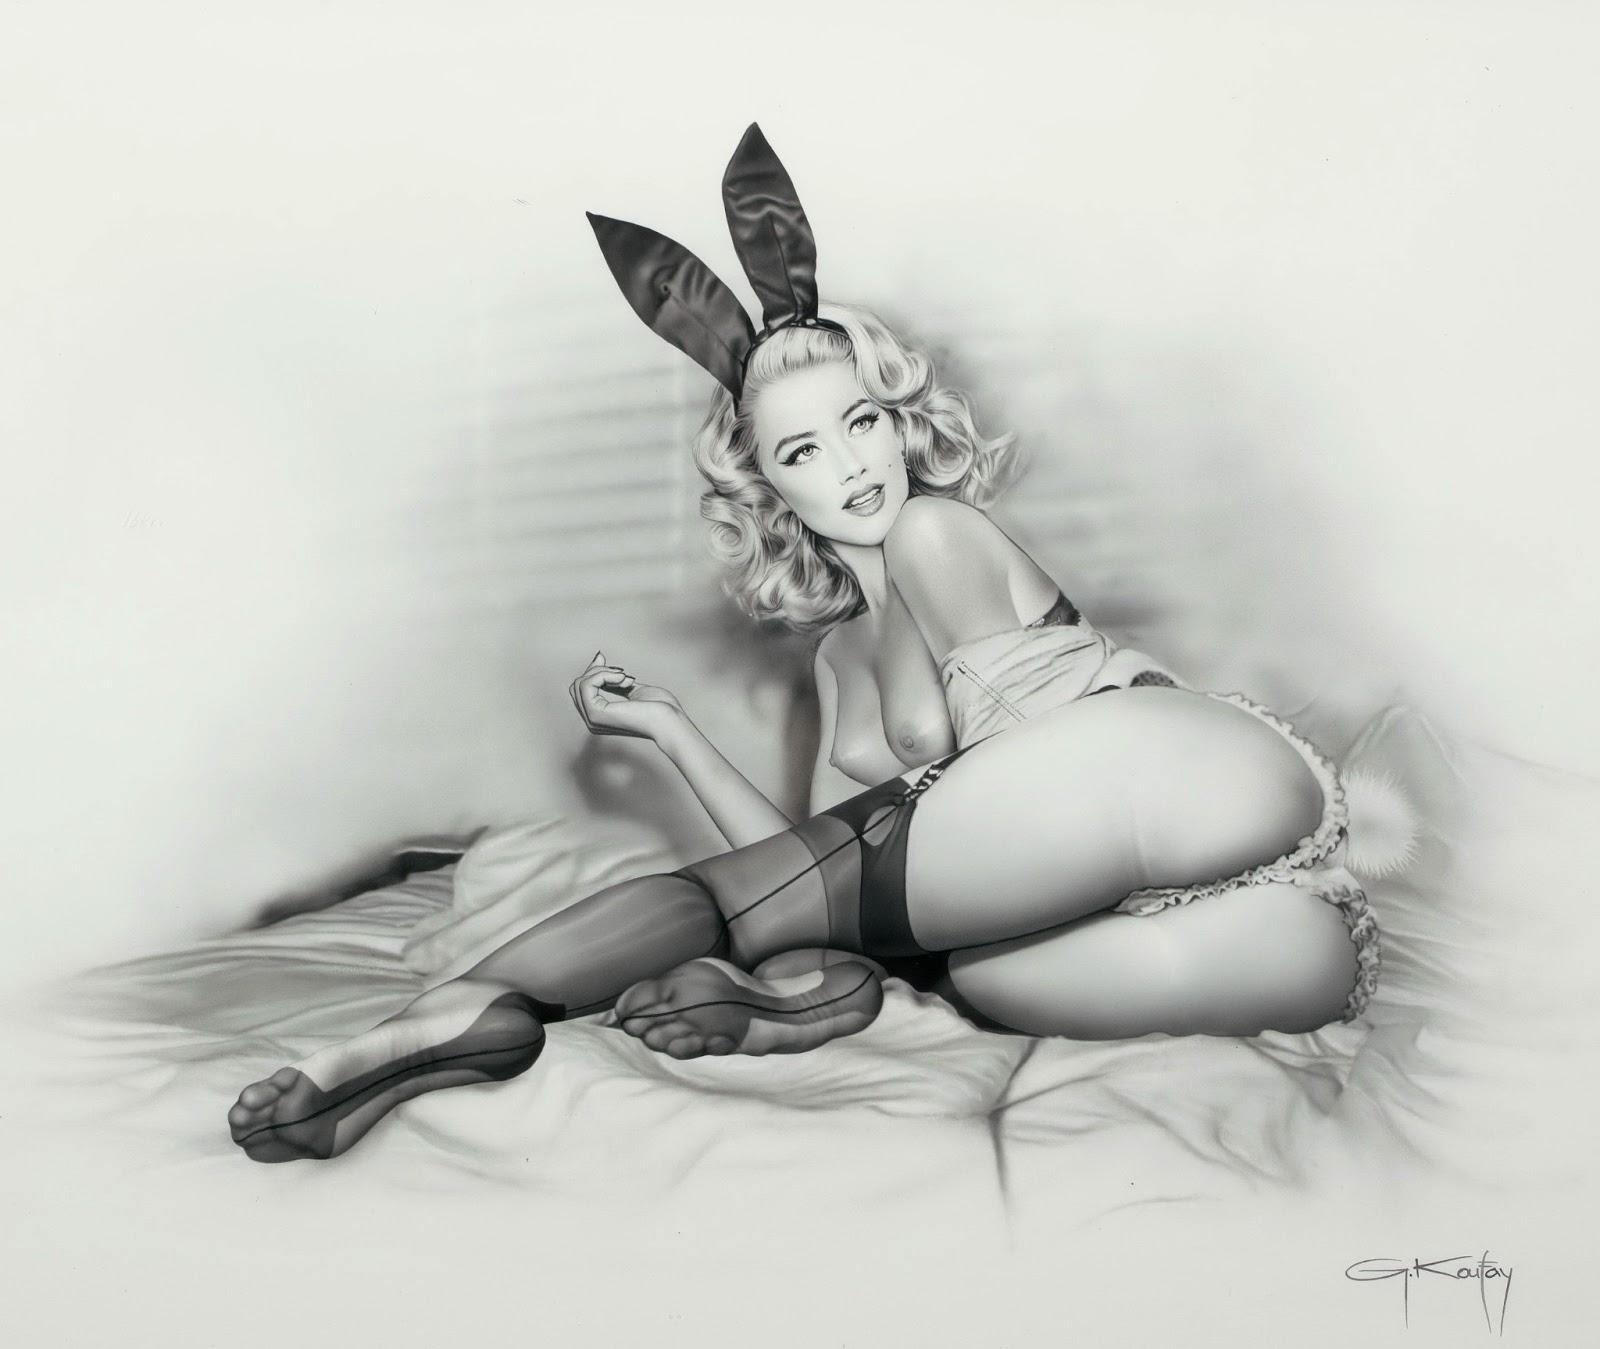 samie-gryazniy-seks-porno-foto